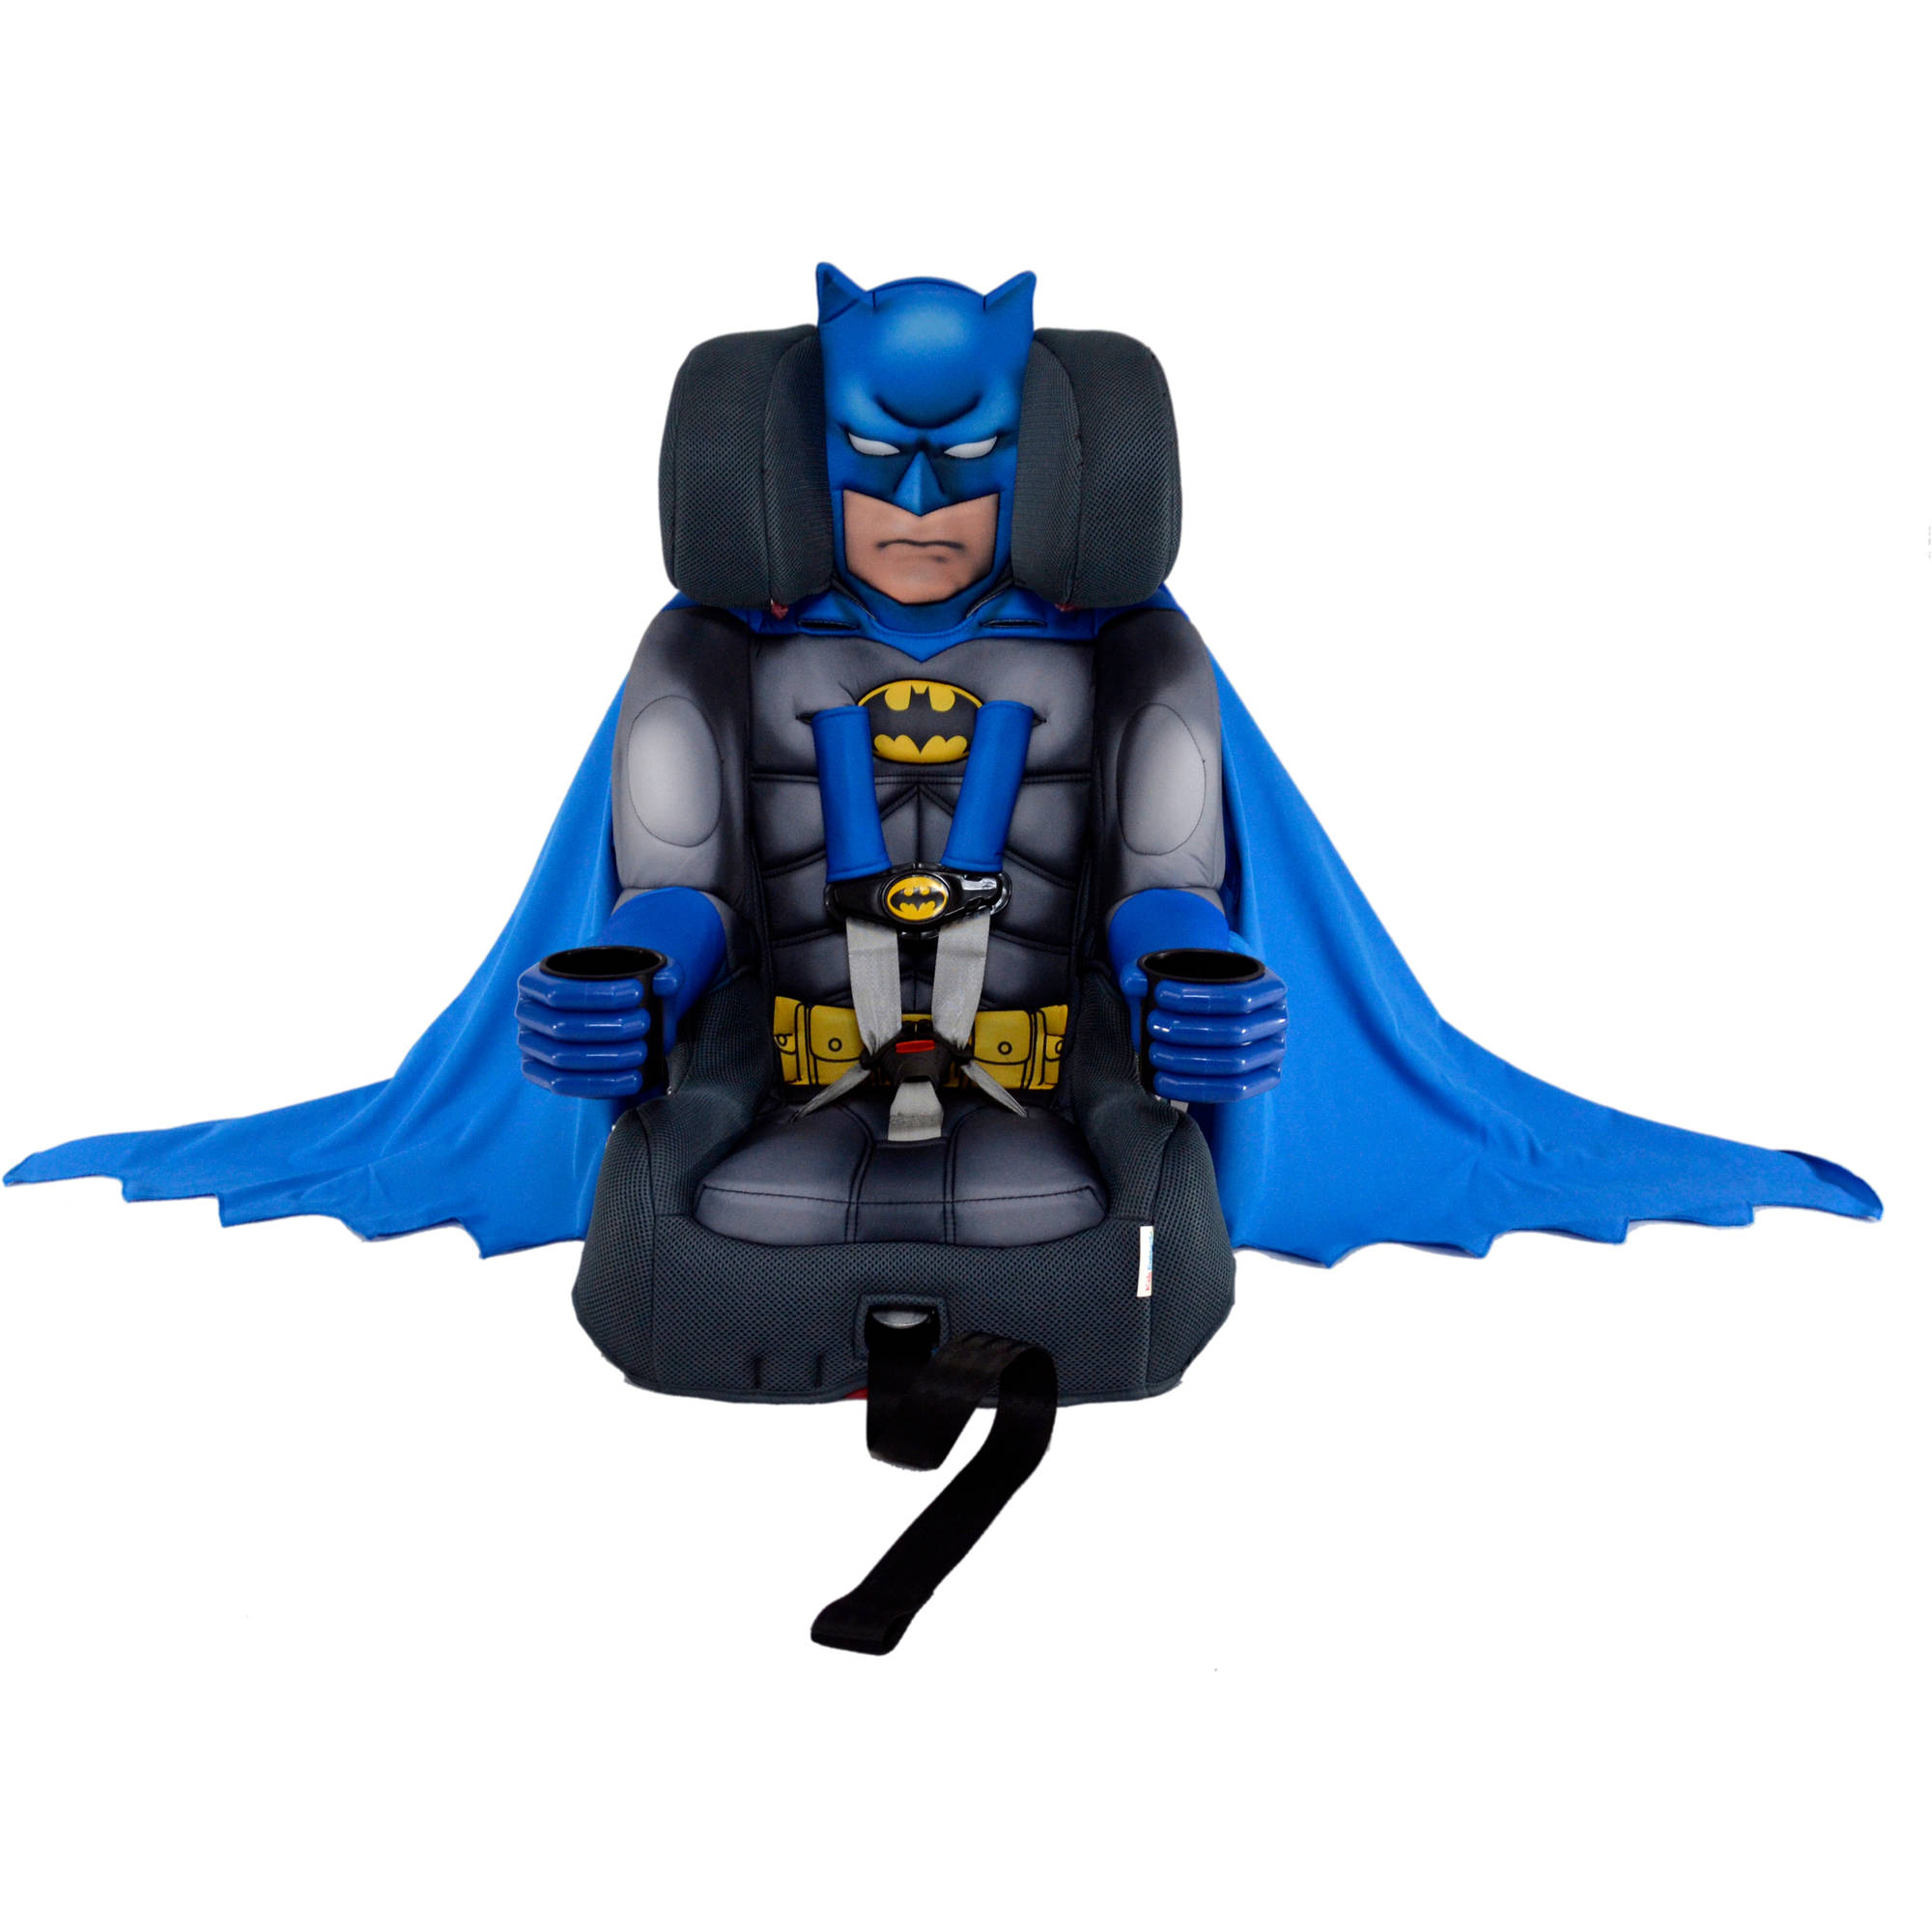 KidsEmbrace DC Comics Batman Combination Booster Car Seat by KidsEmbrace